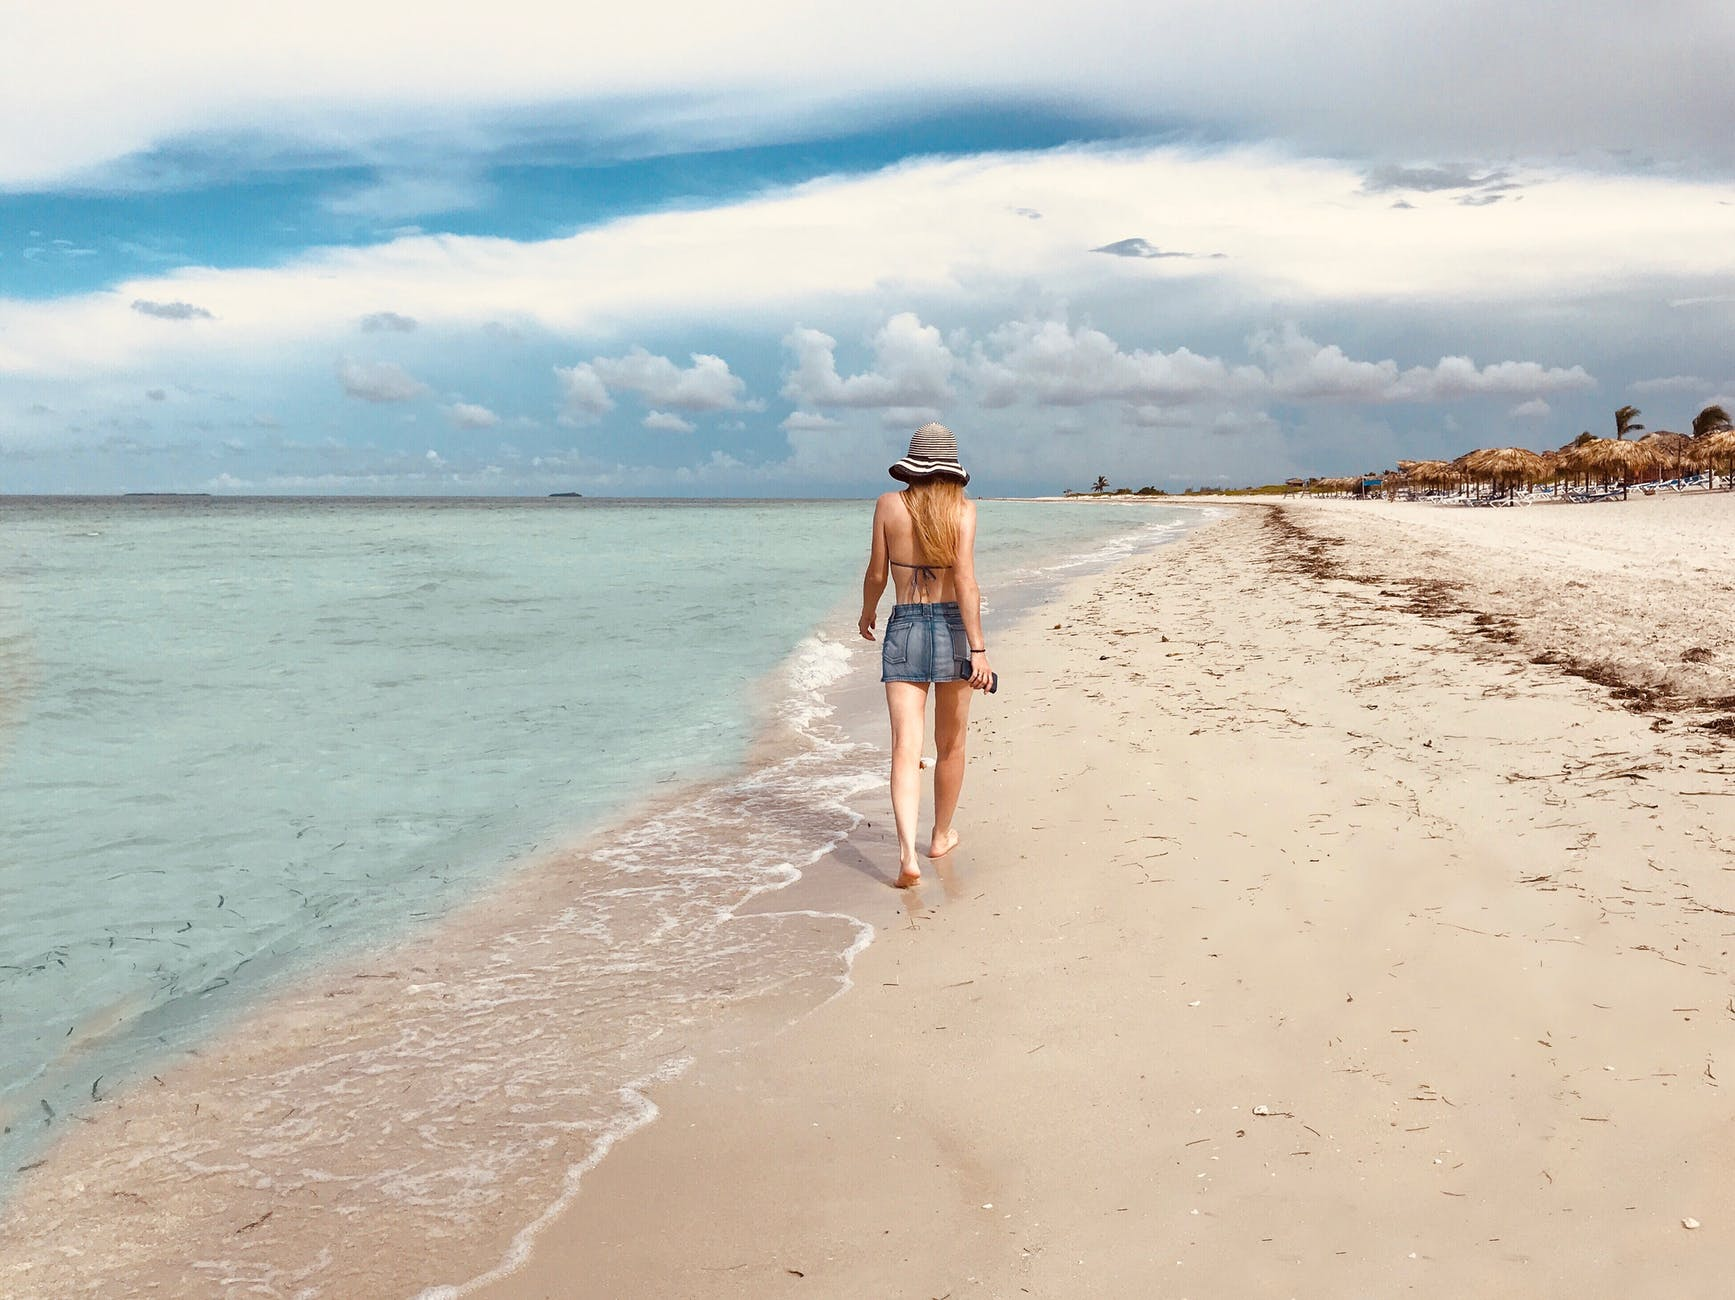 pláž, žena, dovolenka